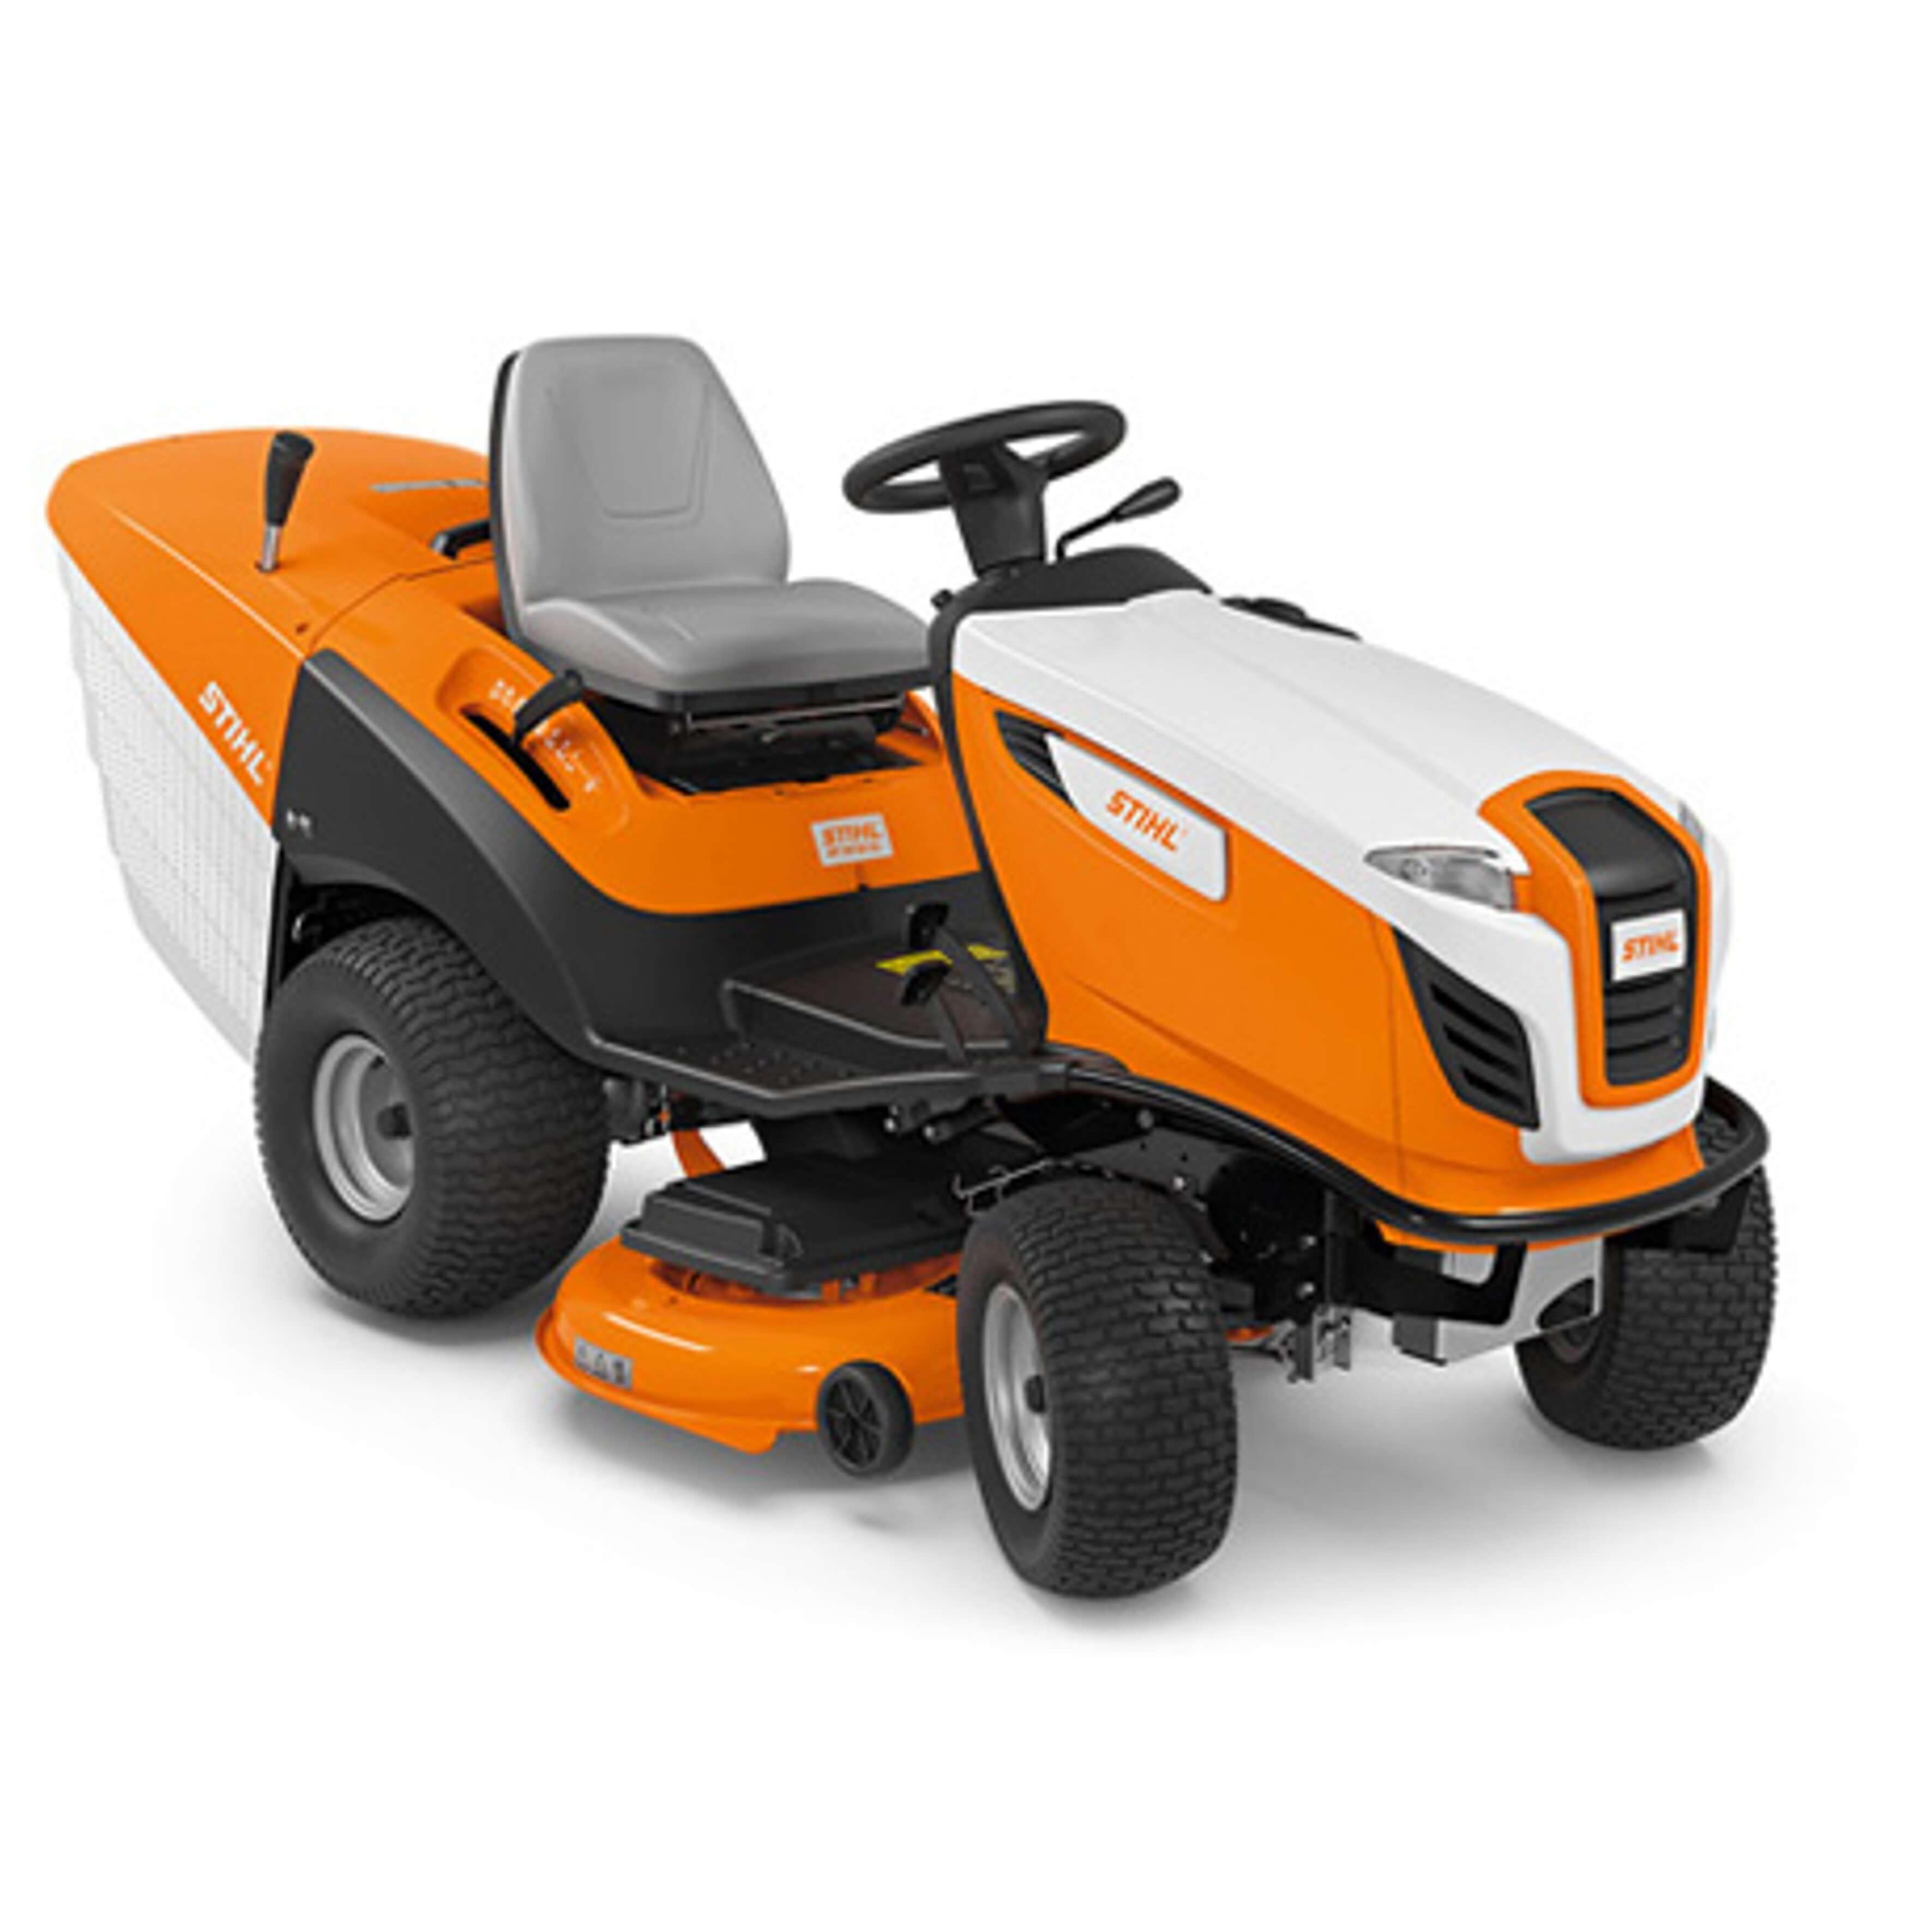 Stihl RT 6112.0 ZL Ride on Mower Parts